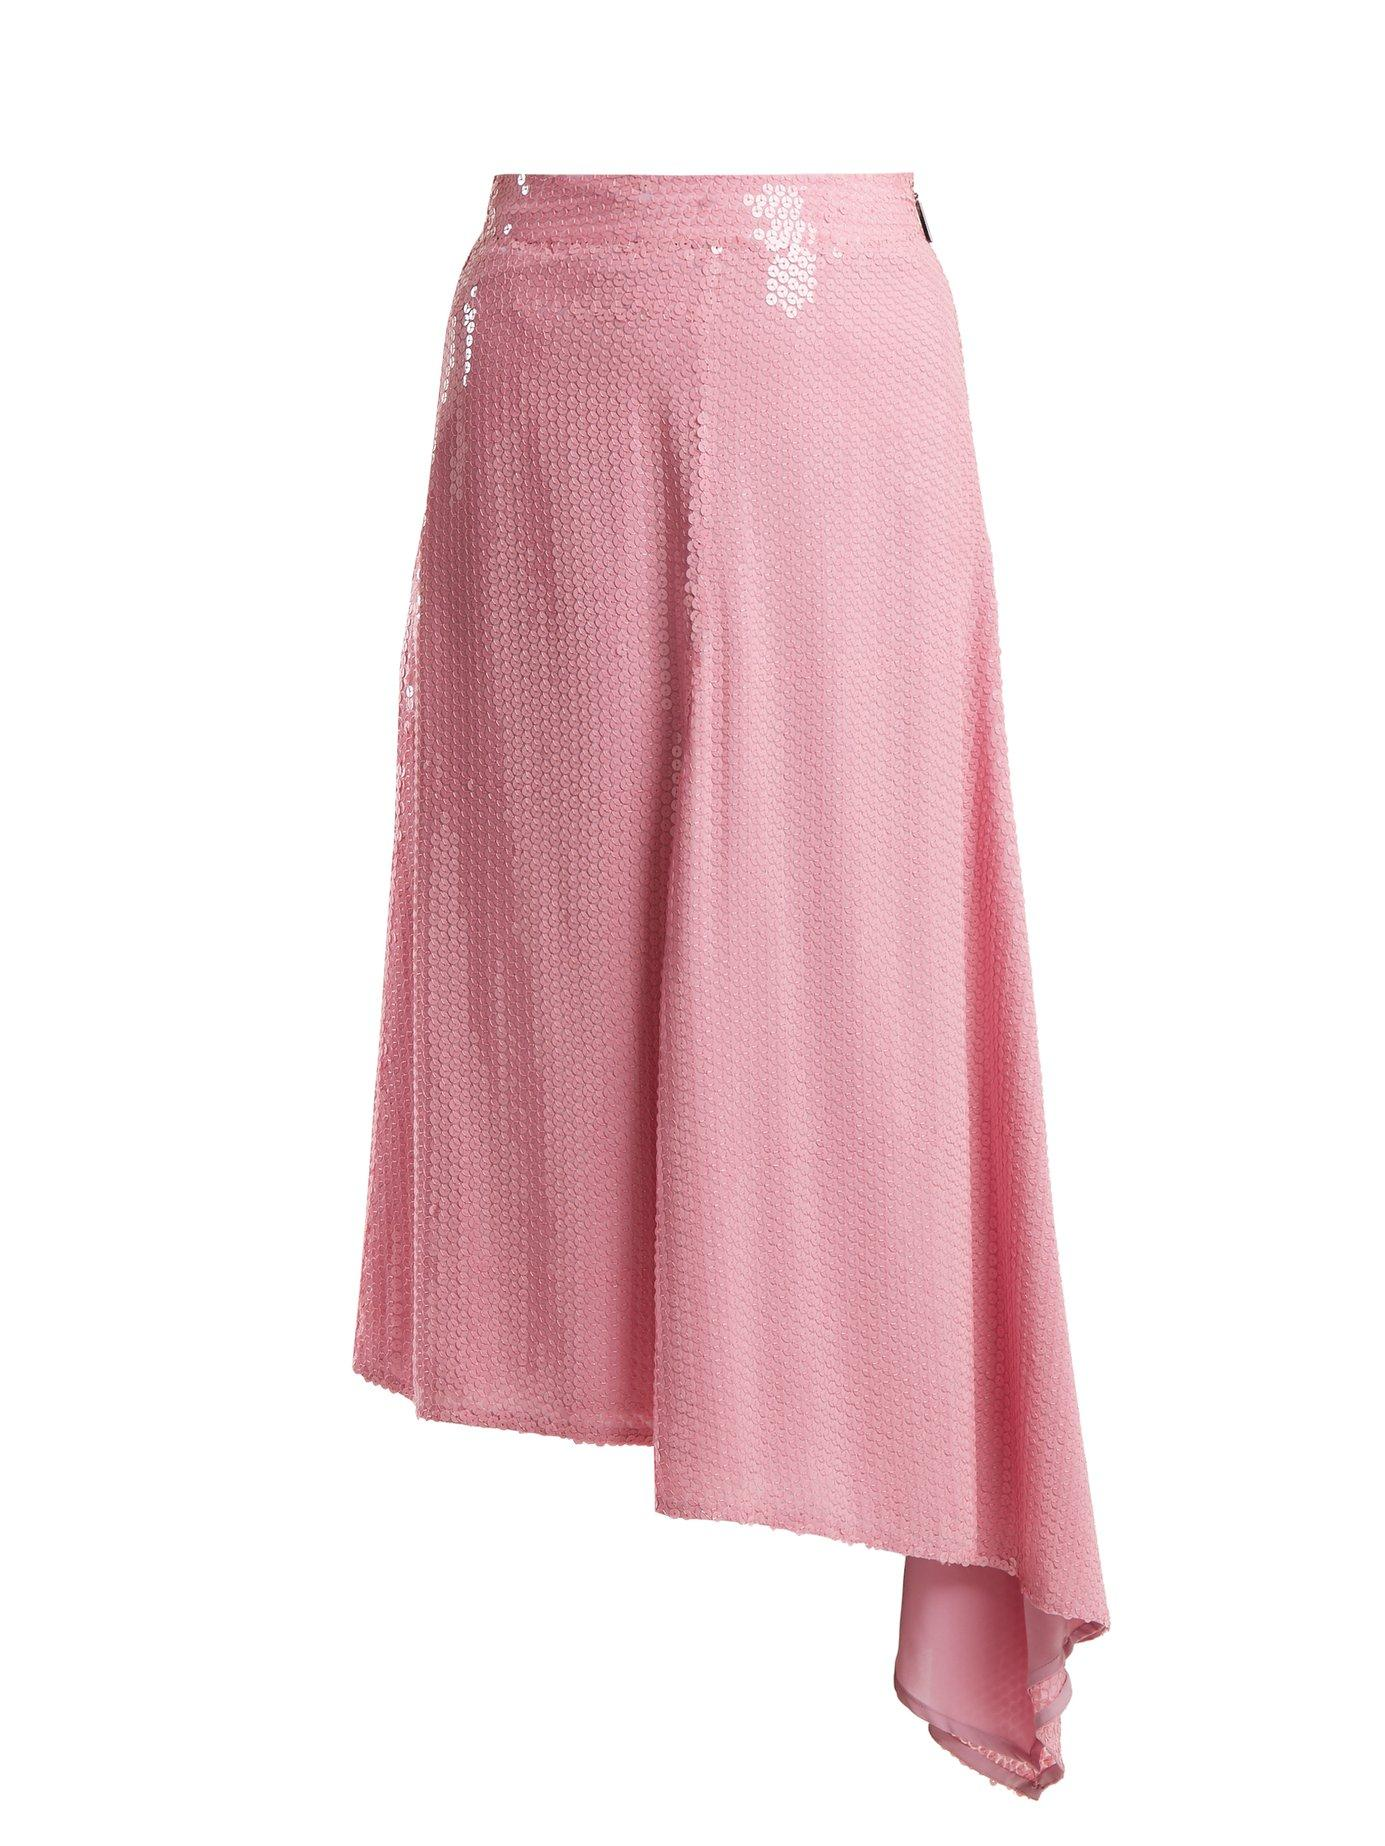 a3c5f3c624 Msgm - Sequin Embellished Asymmetric Midi Skirt - Womens - Pink ...